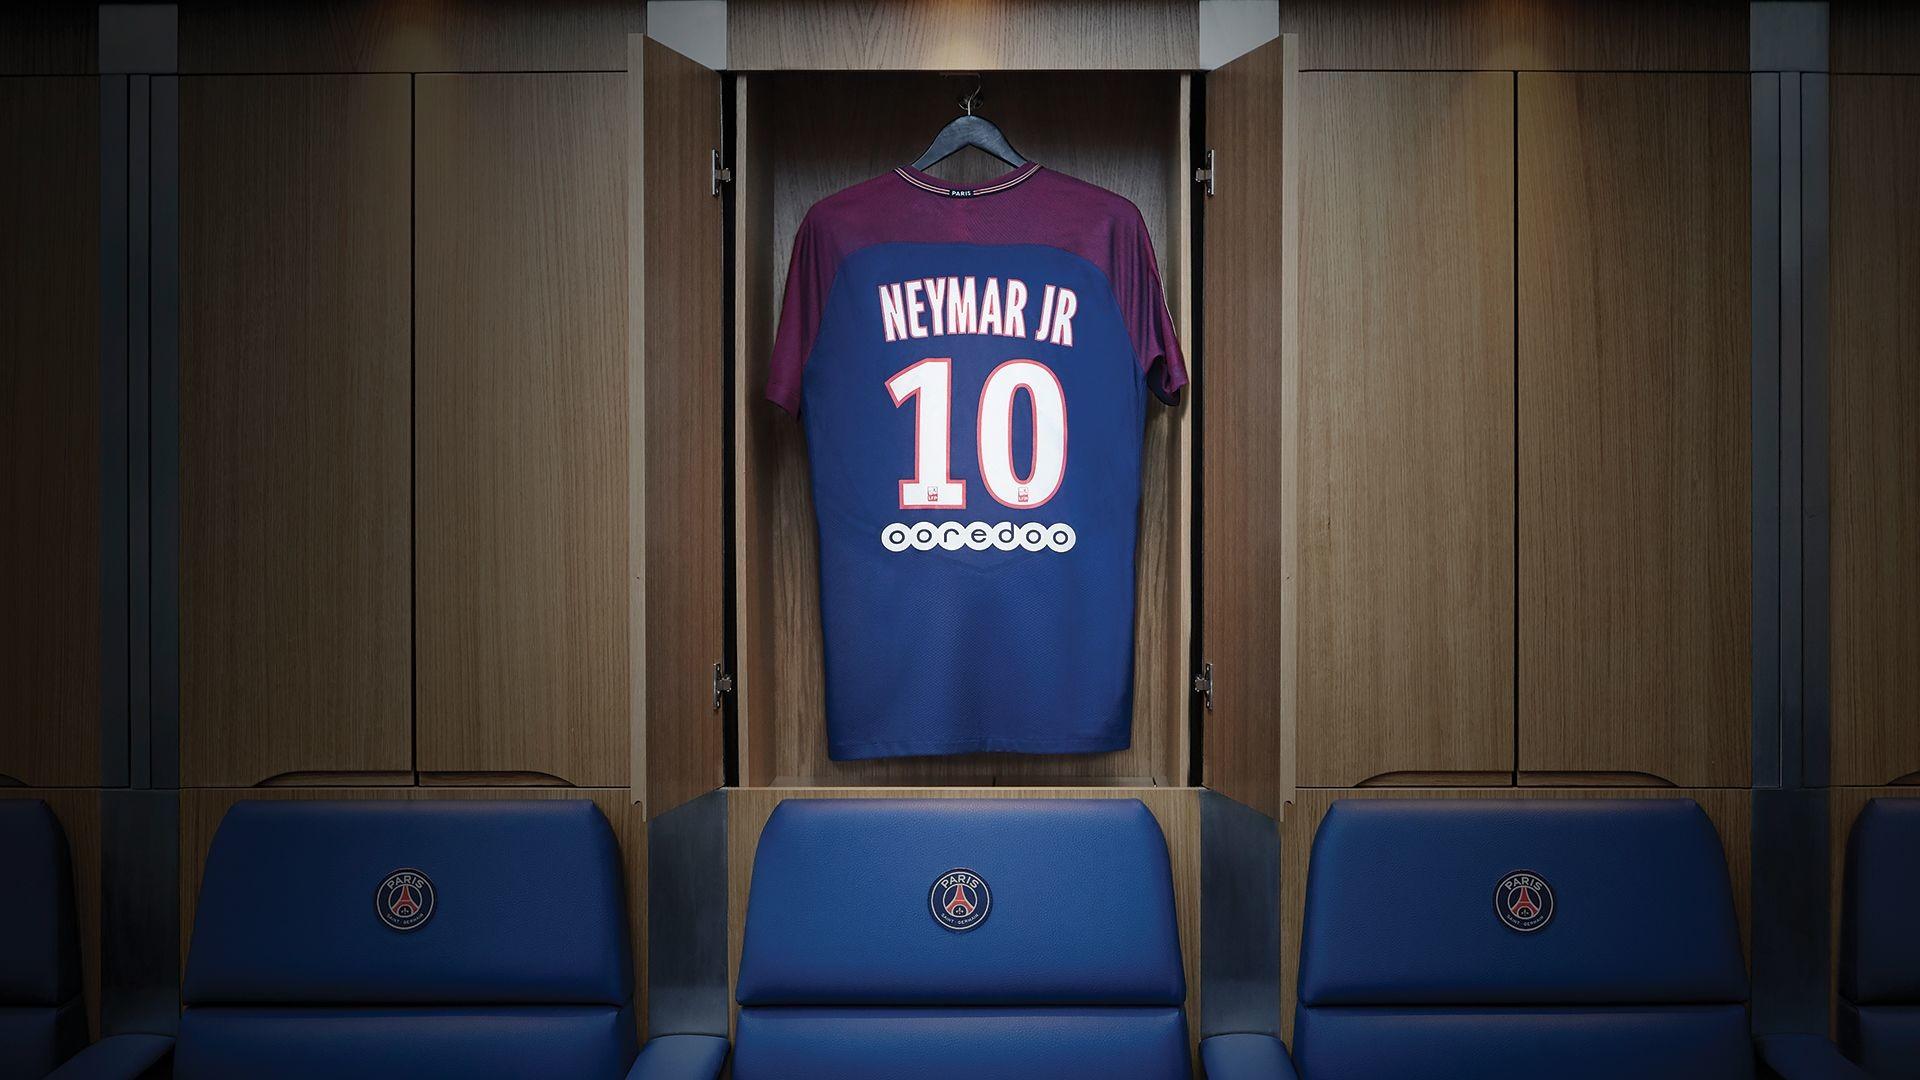 neymar hd wallpapers 1080p 2015